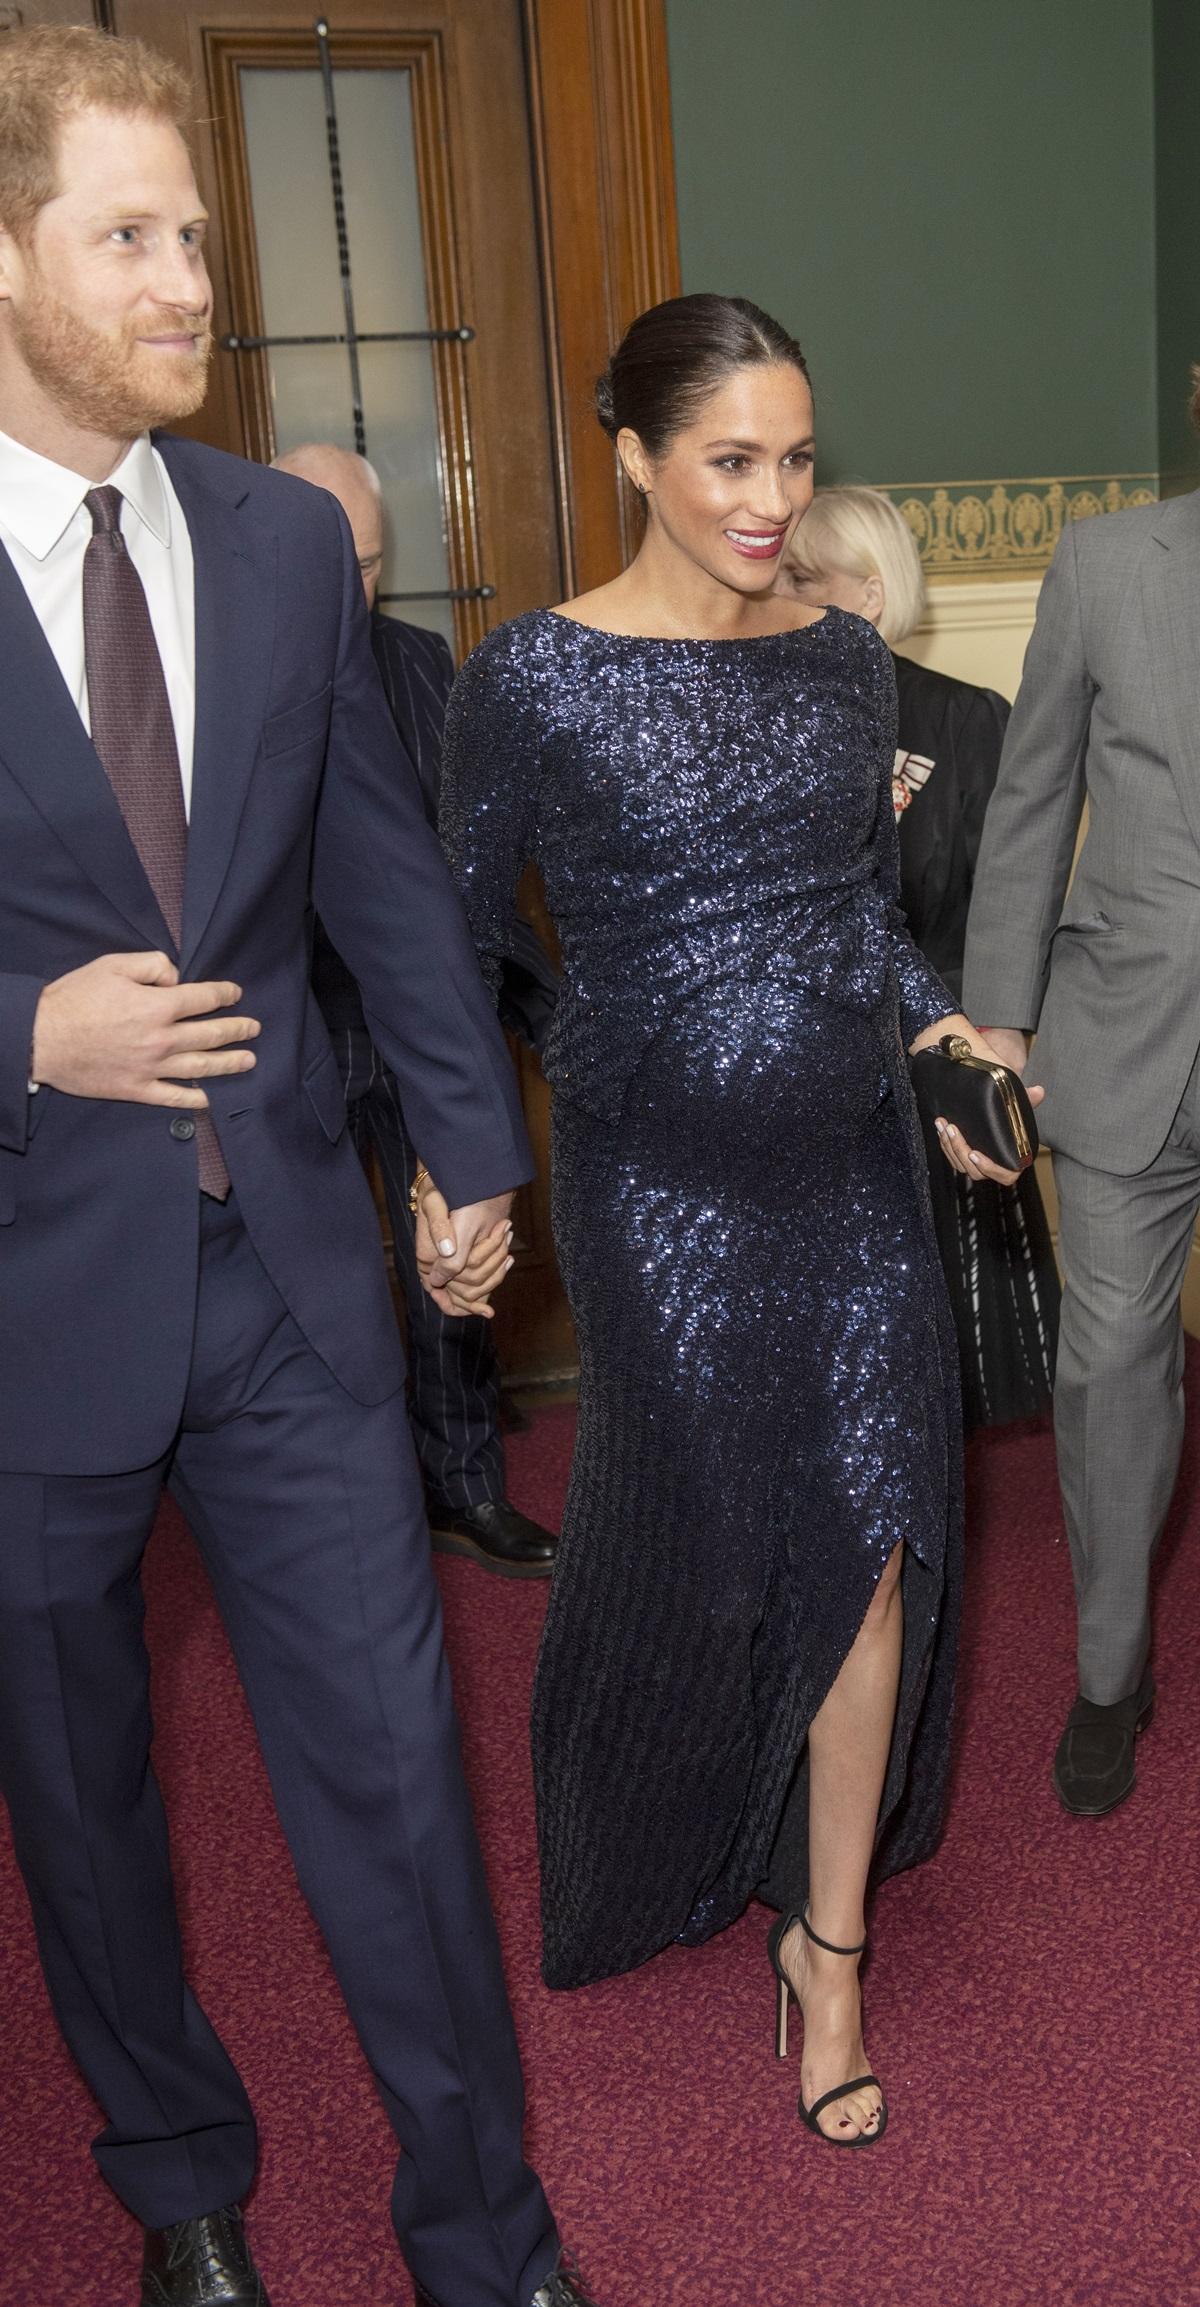 Ciężarna księżna Meghan w cekinowej sukni